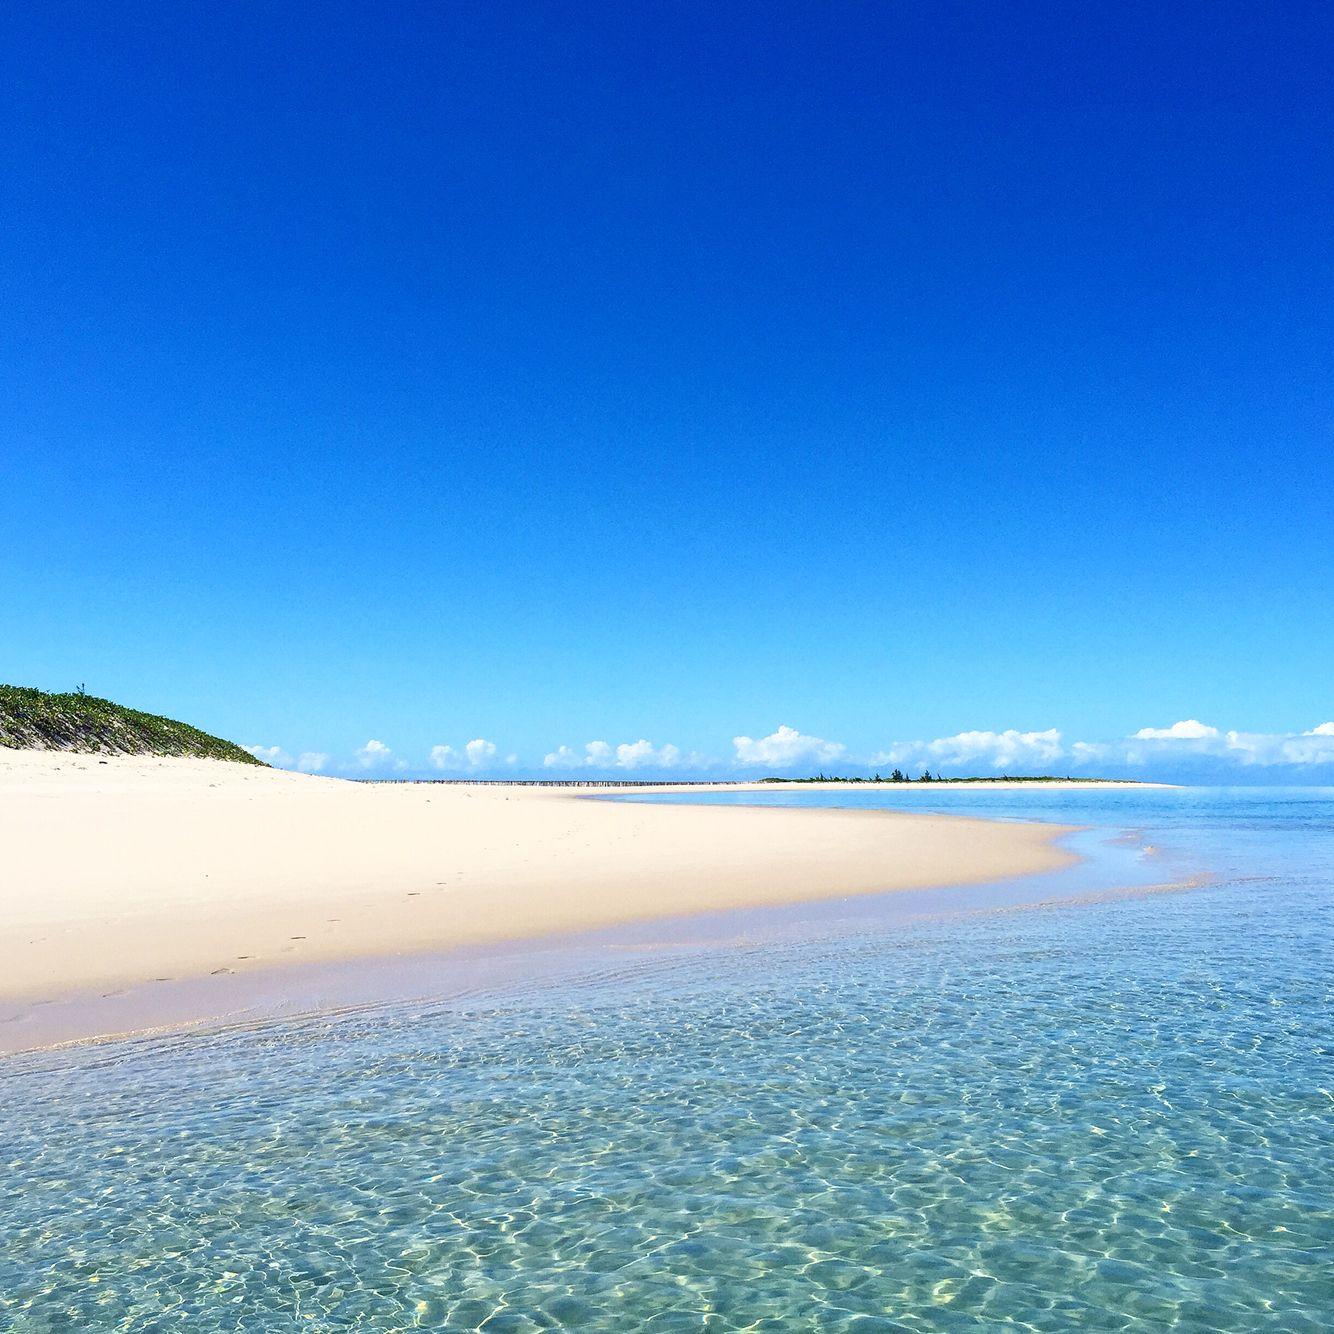 Bangue Island Vilankulo Mozambique Bangue Island Vilankulo Mozambique Tourism Beach Destination Amazing Su Beautiful Islands Island Hopping Tourism